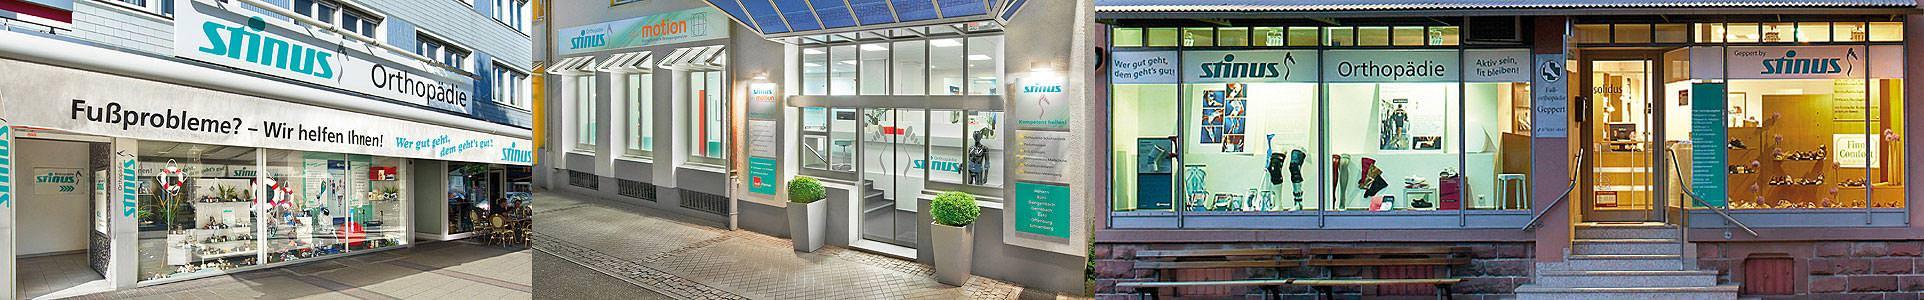 Stinus Orthopädietechnik: Achern, Bühl, Offenburg - Sanitätshaus